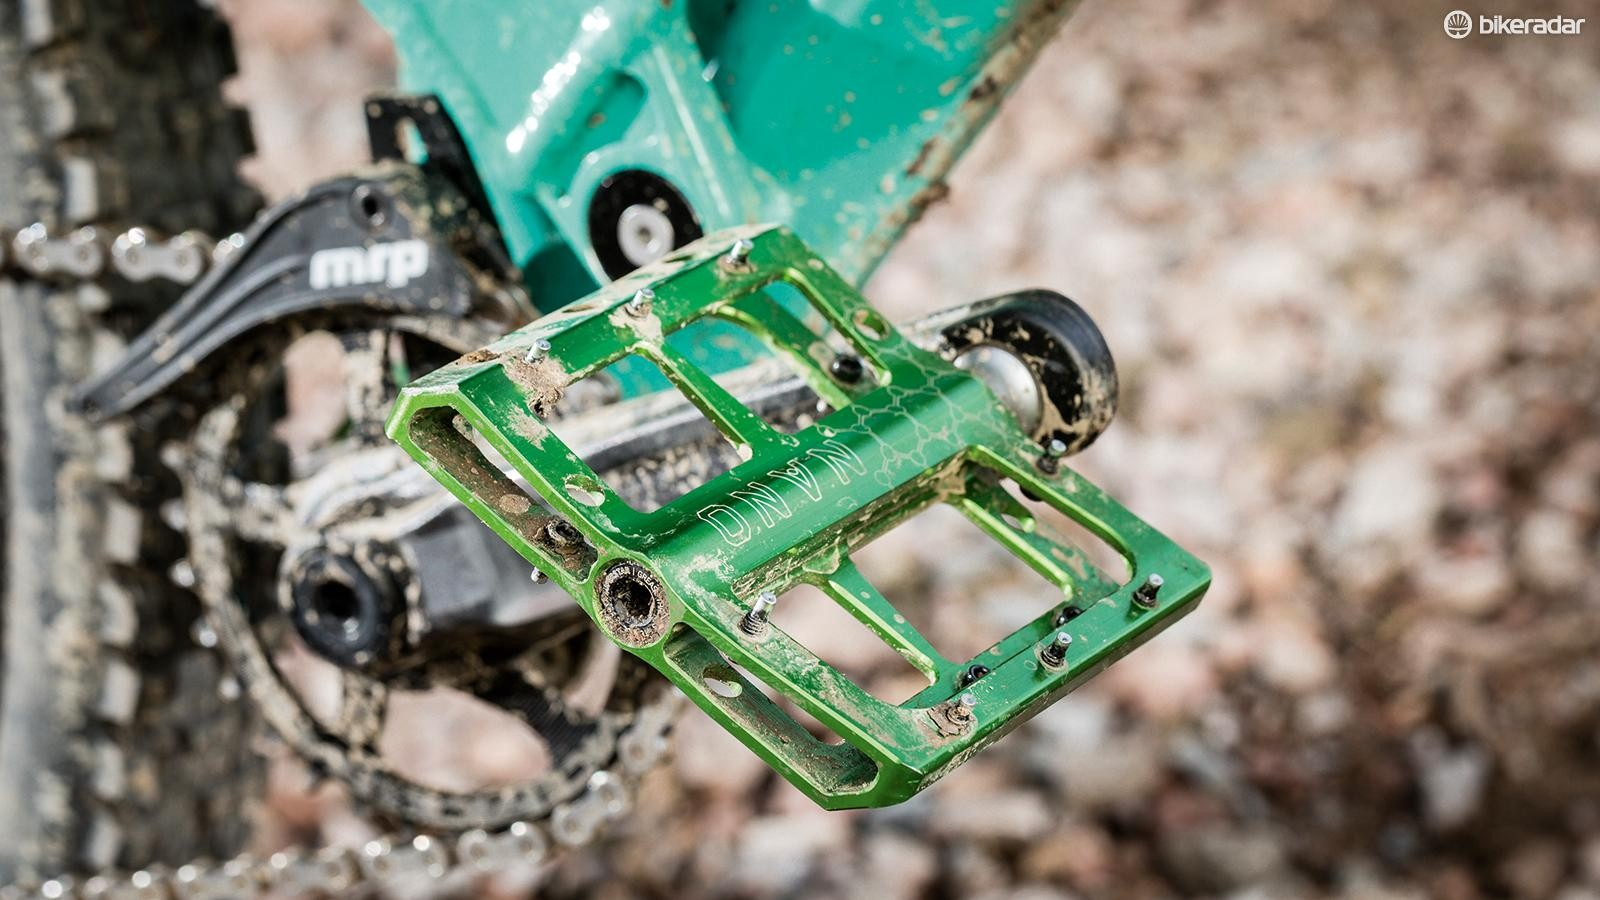 Superstar Nano-x flat pedals